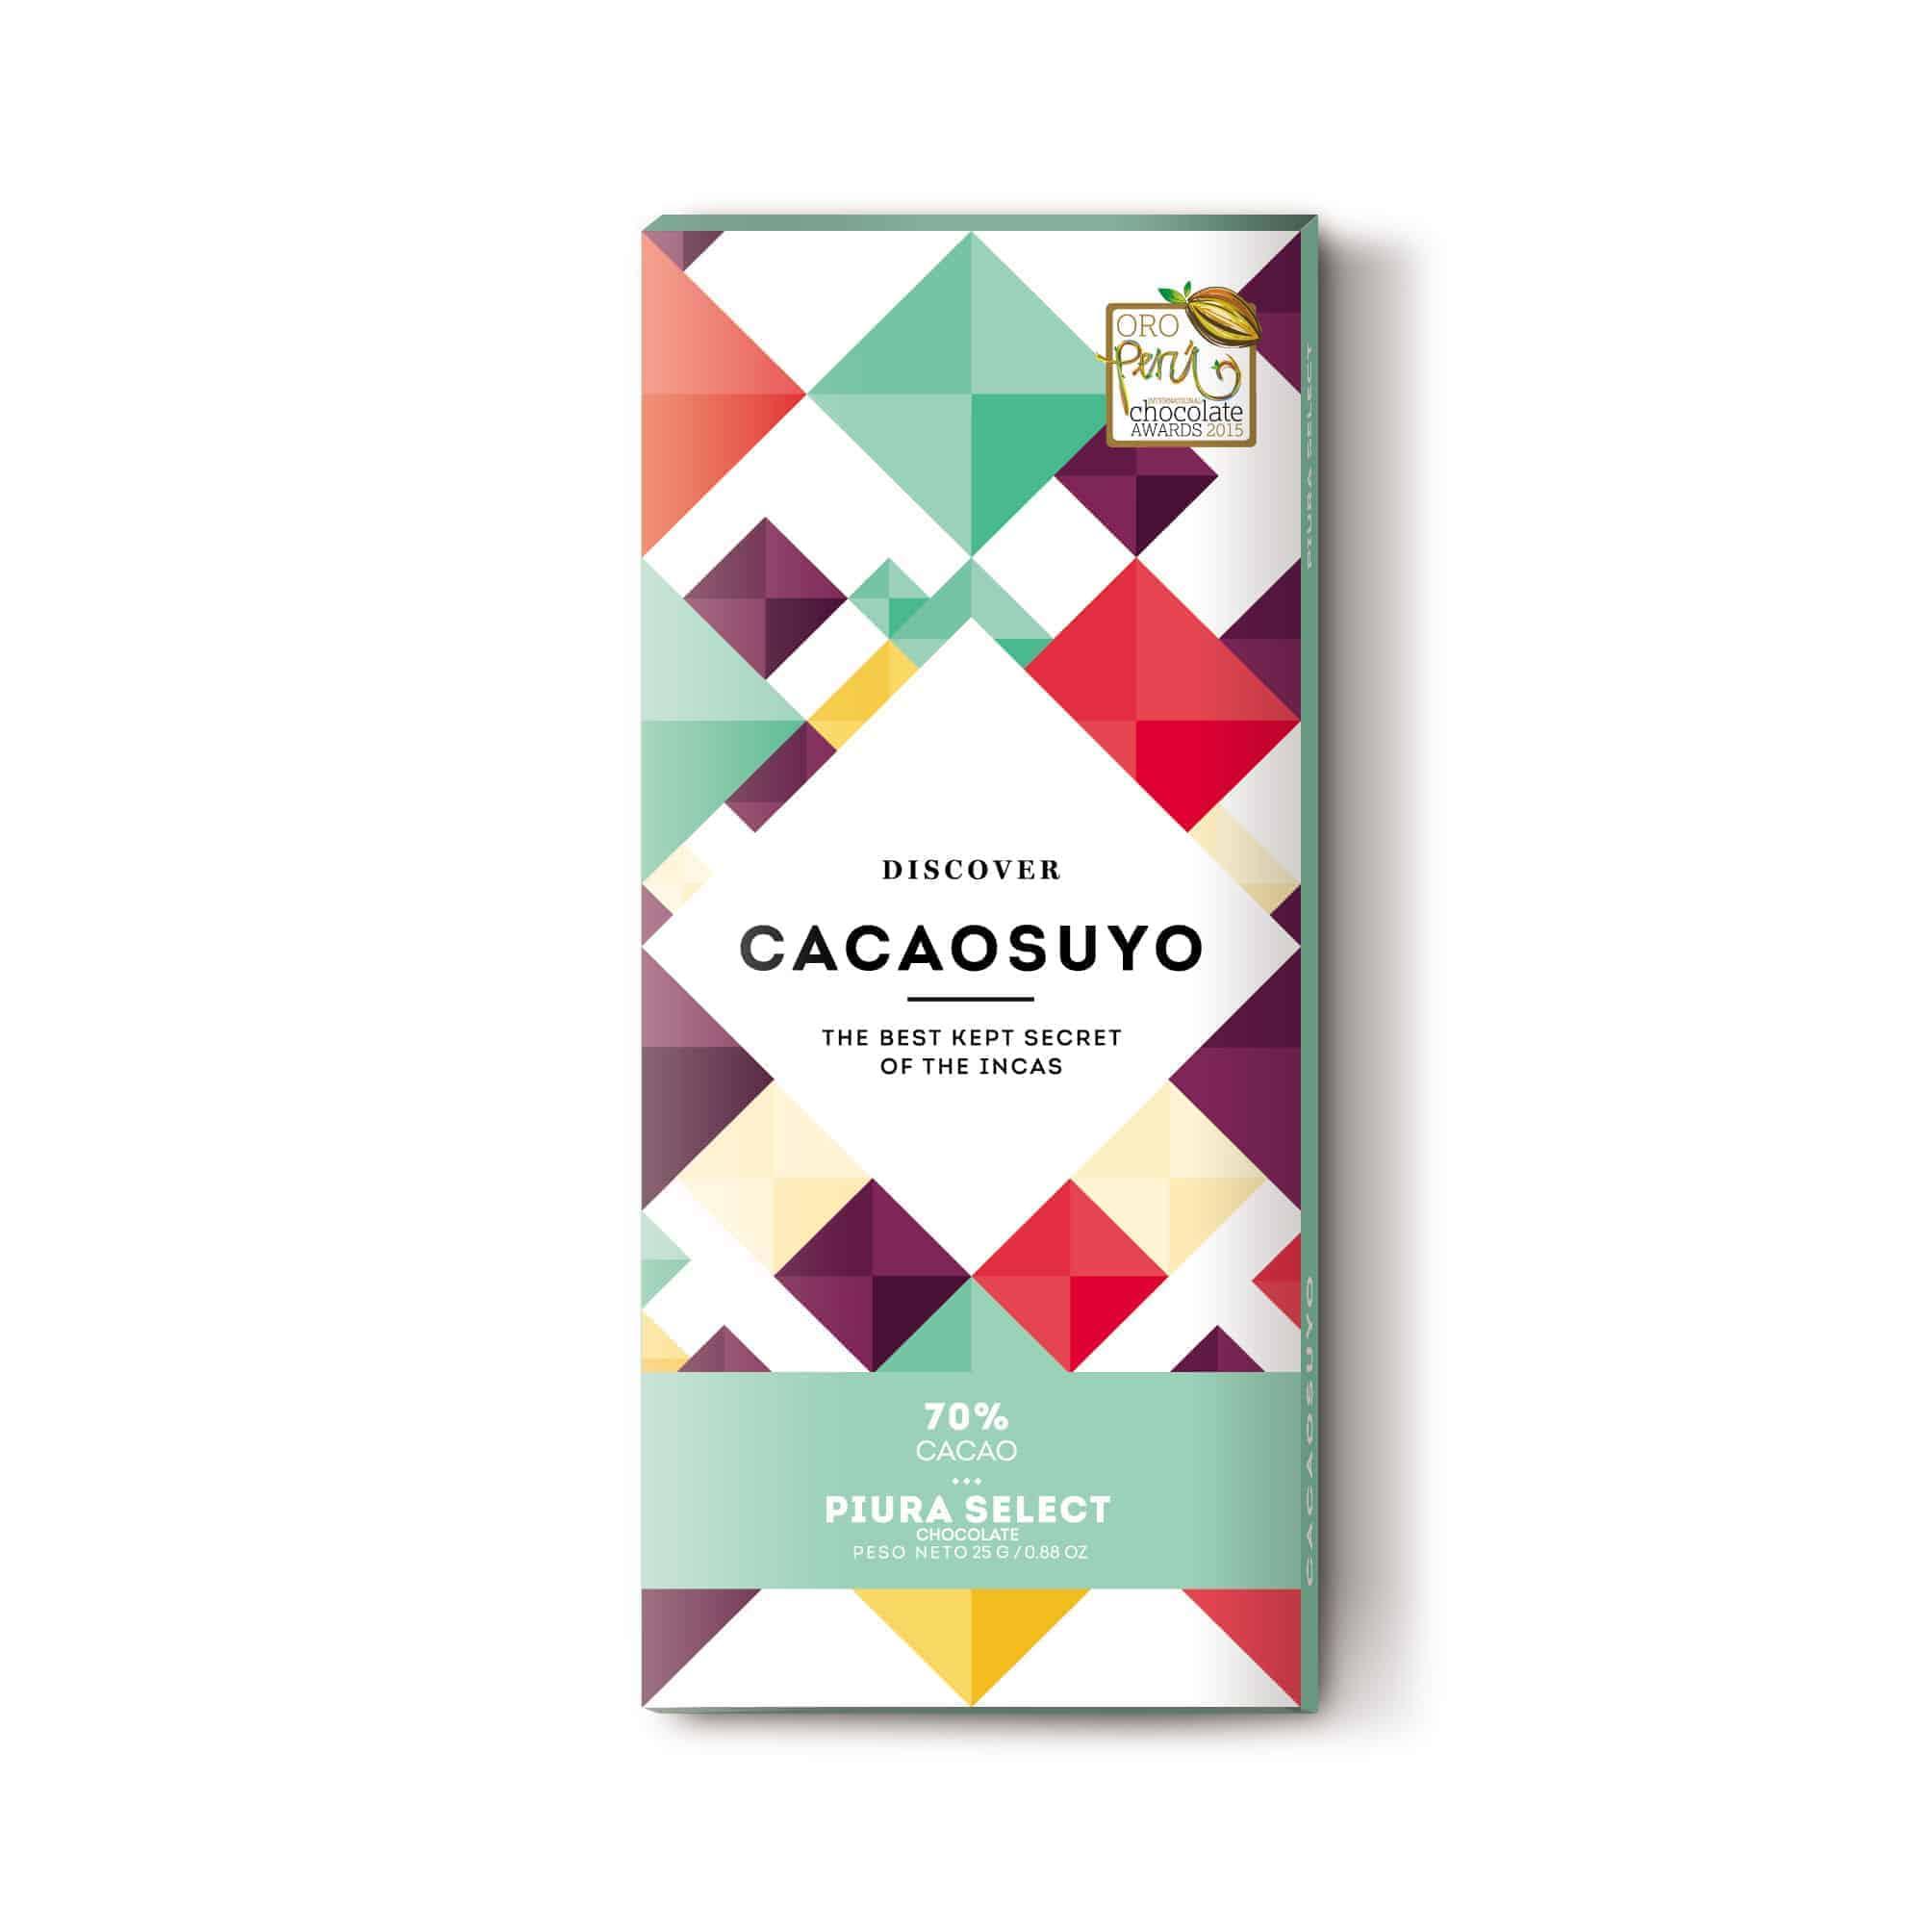 Piura Select 70% Cacao